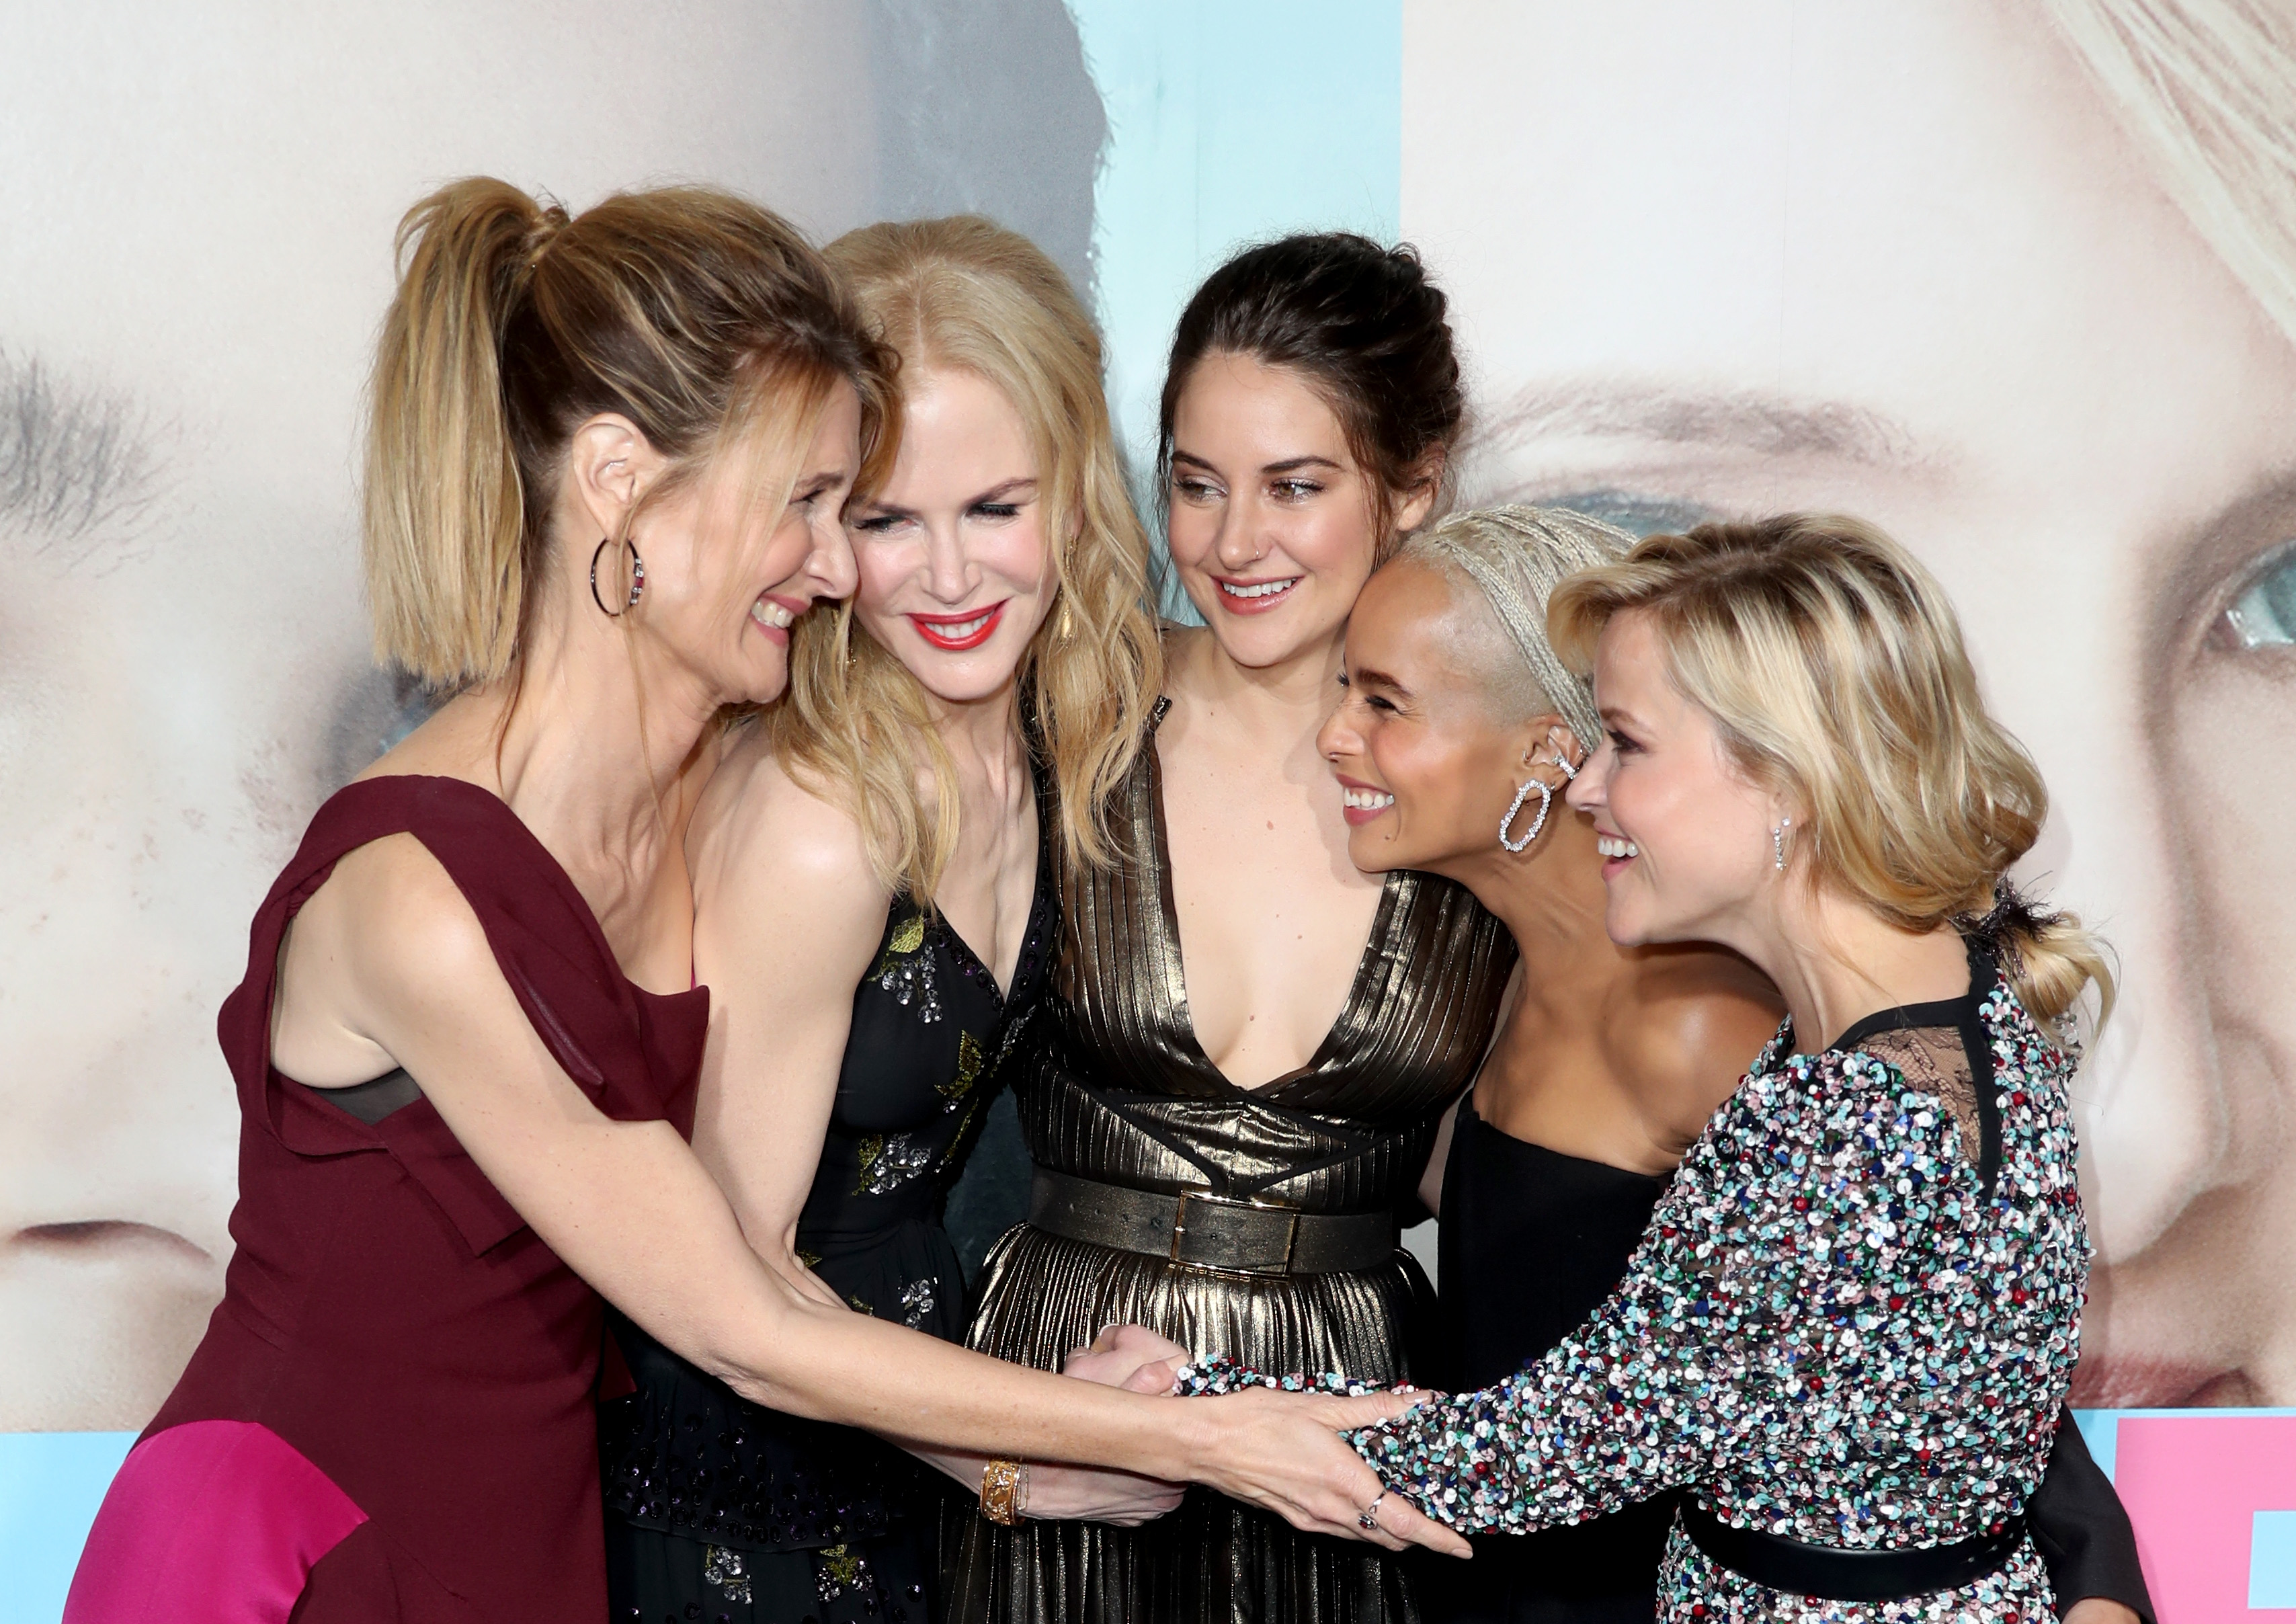 Actors Laura Dern, Nicole Kidman, Shailene Woodley, Zoe Kravitz, and Reese Witherspoon